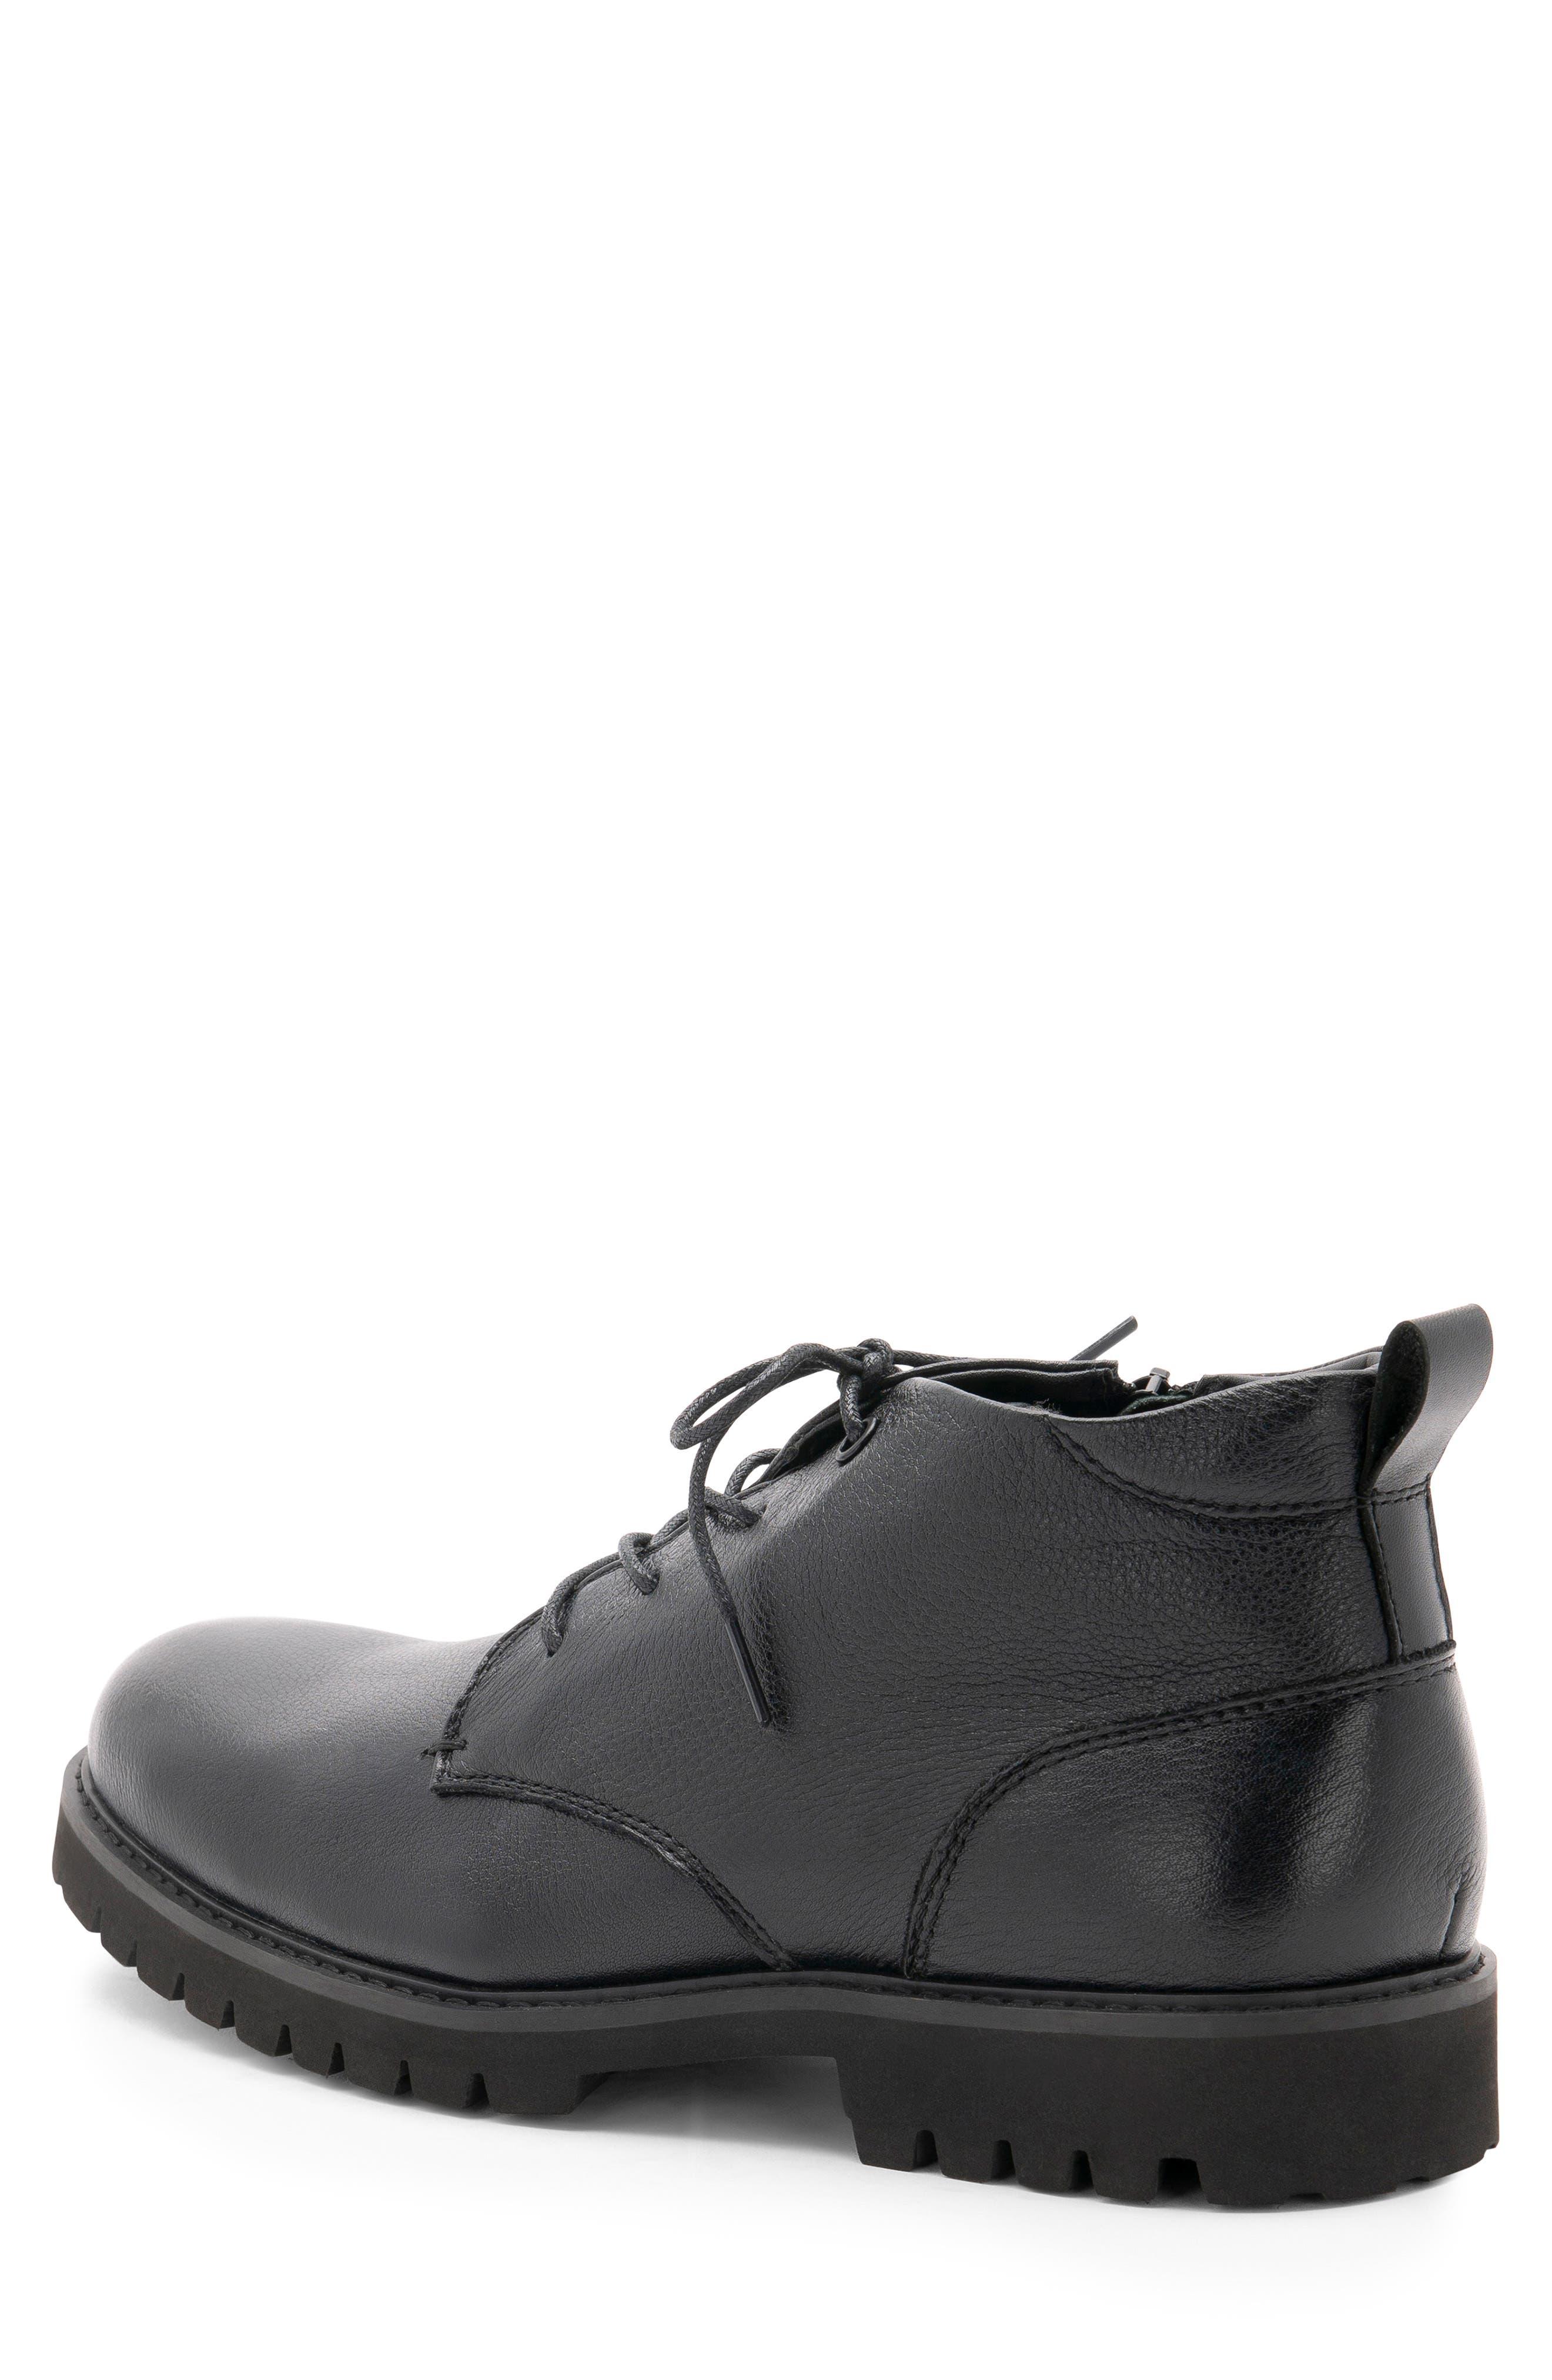 BLONDO,                             Max Chukka Waterproof Boot,                             Alternate thumbnail 2, color,                             BLACK LEATHER